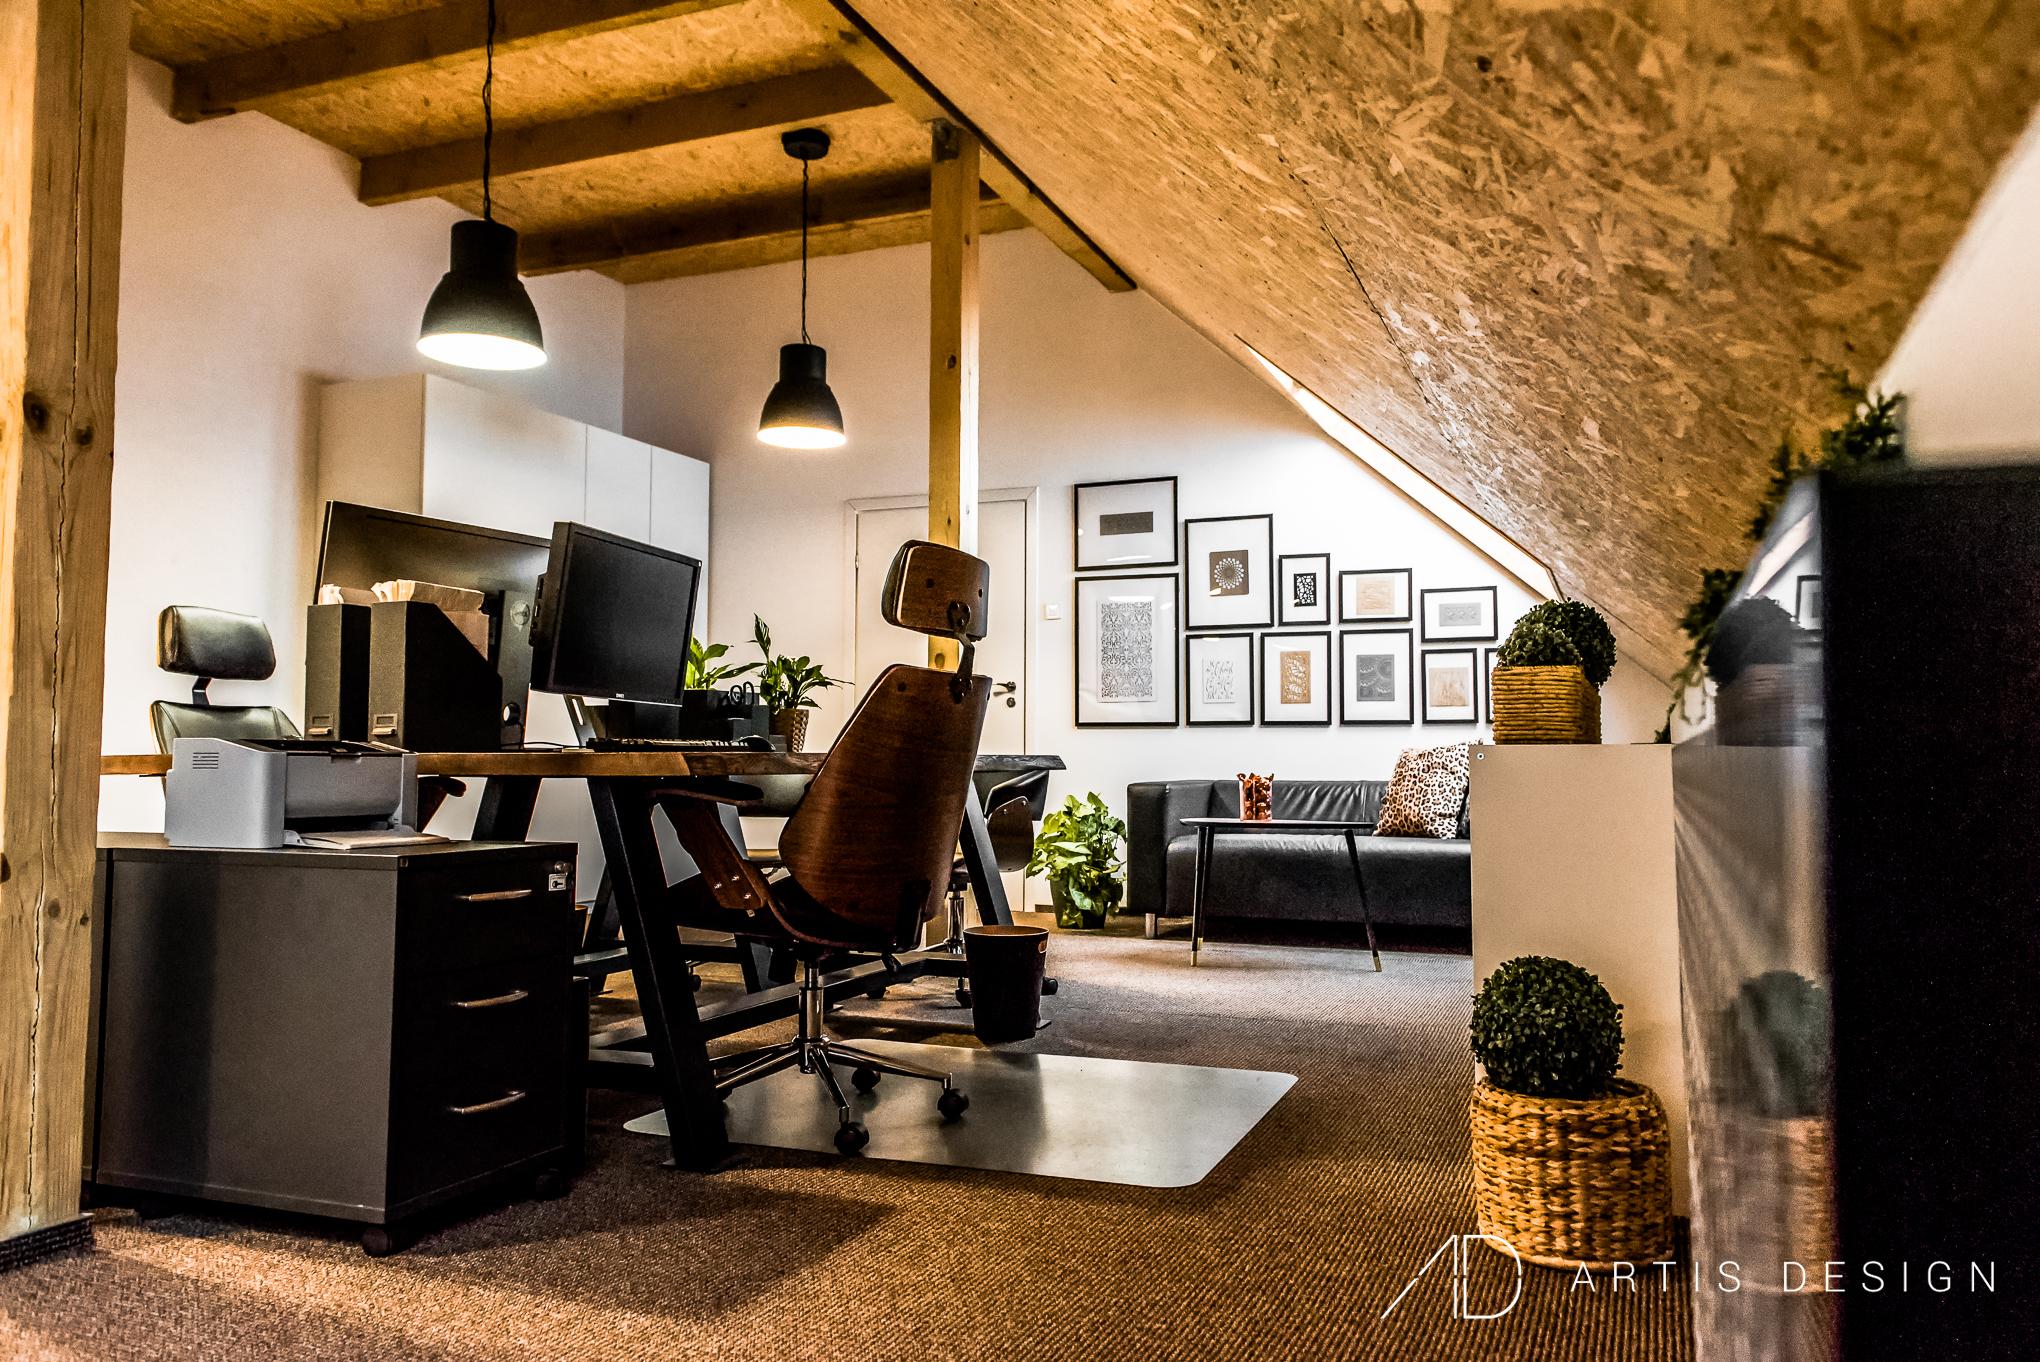 Projekt: Loftowe biuro   Artis Design: Studio projektowe